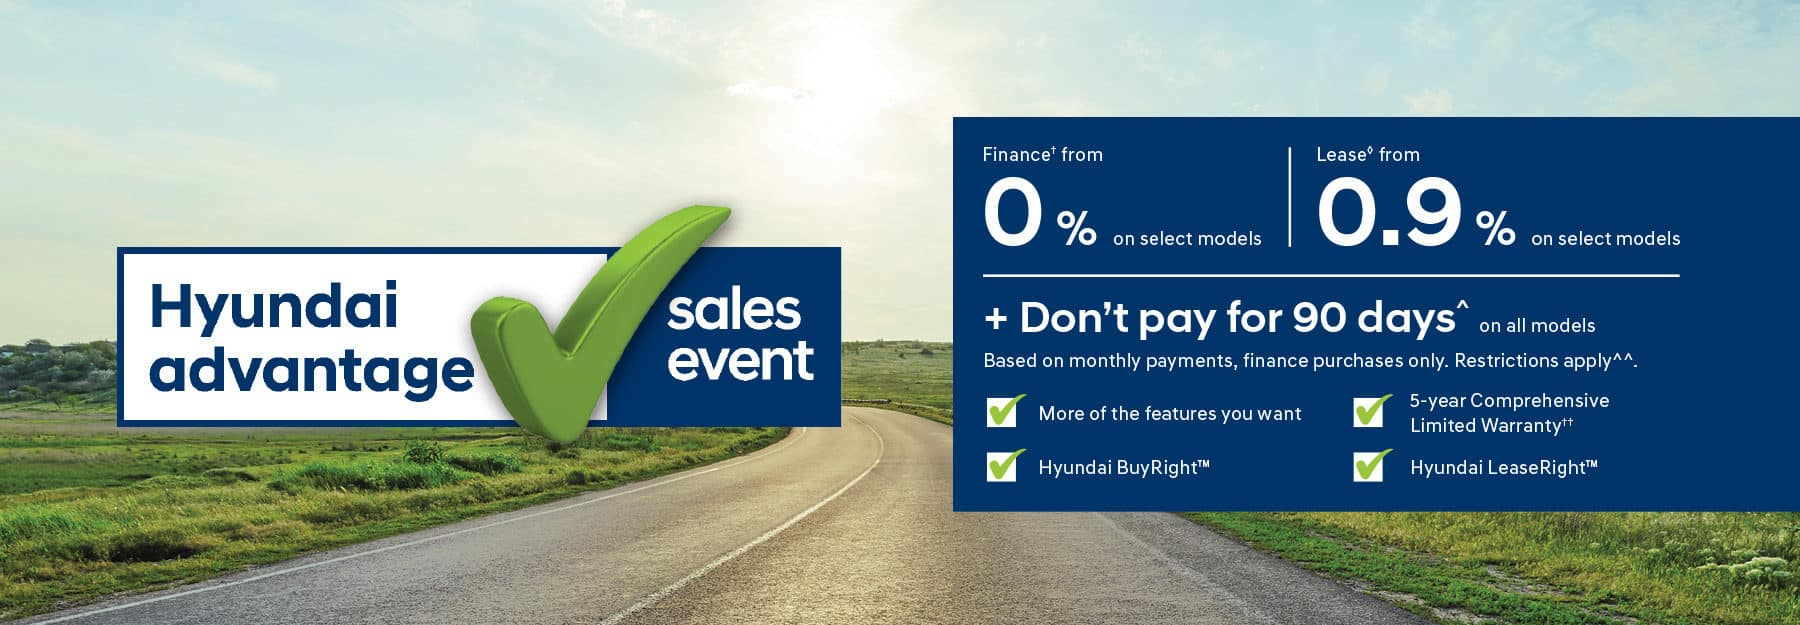 Hyundai Advantage Sale Event on now